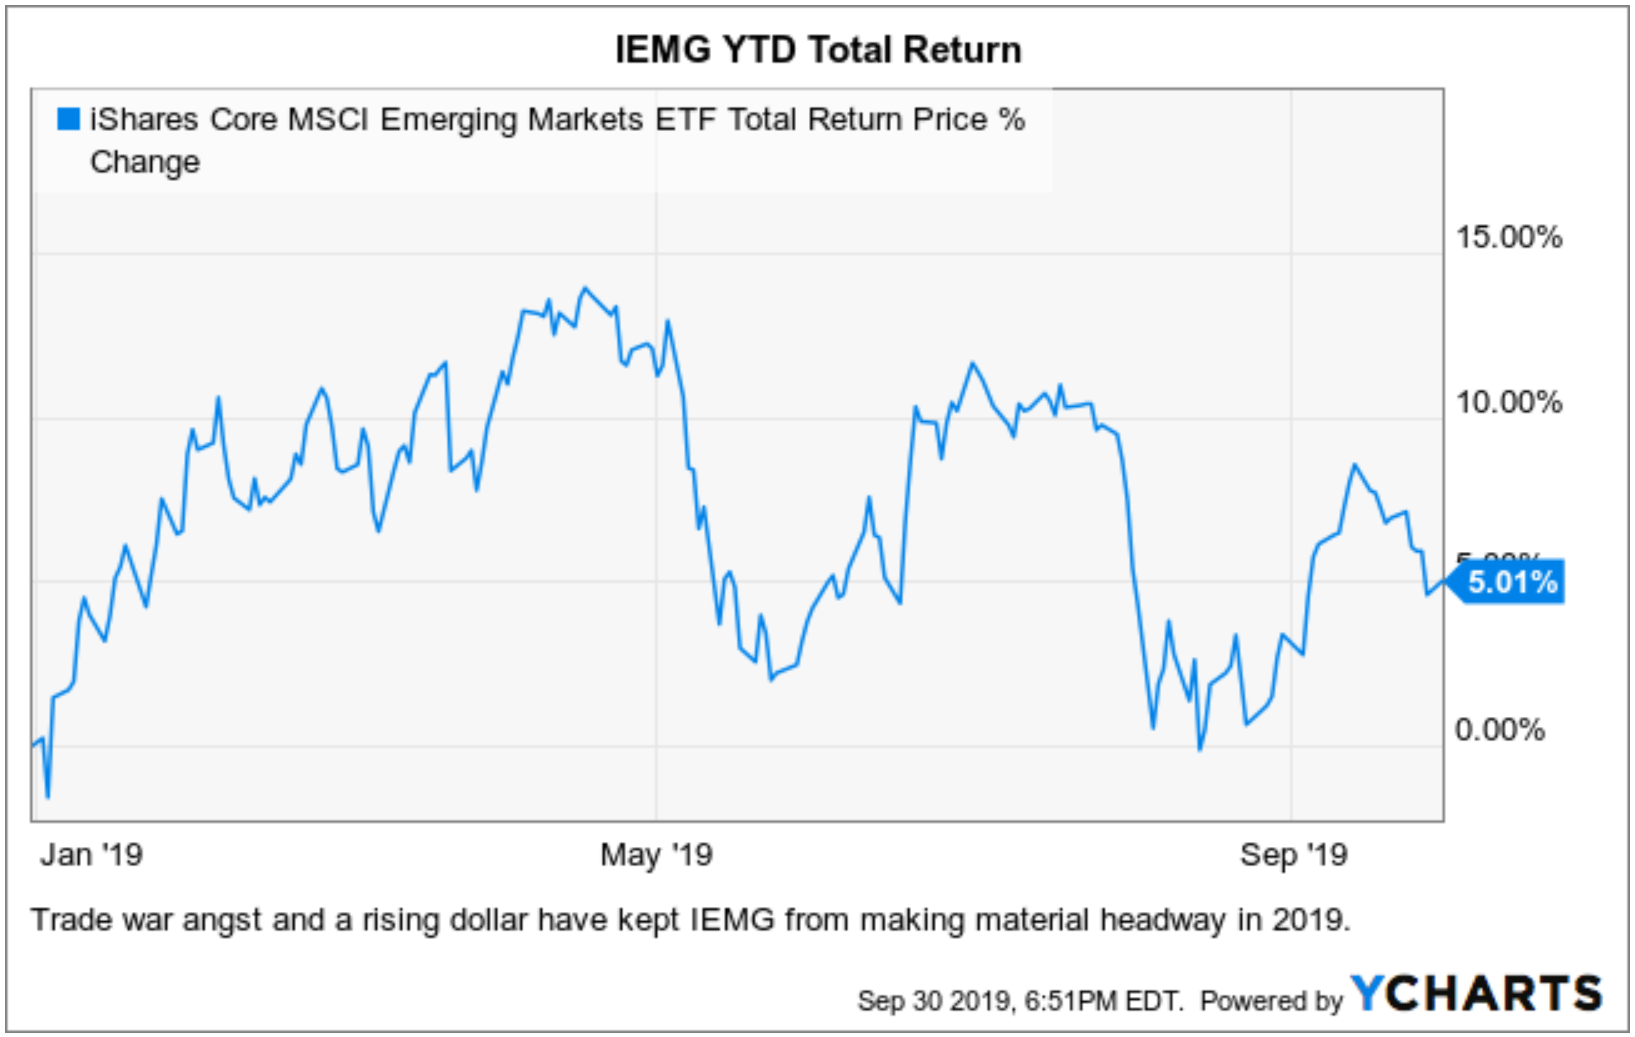 Does IEMG Still Rank Among the Best ETFs?